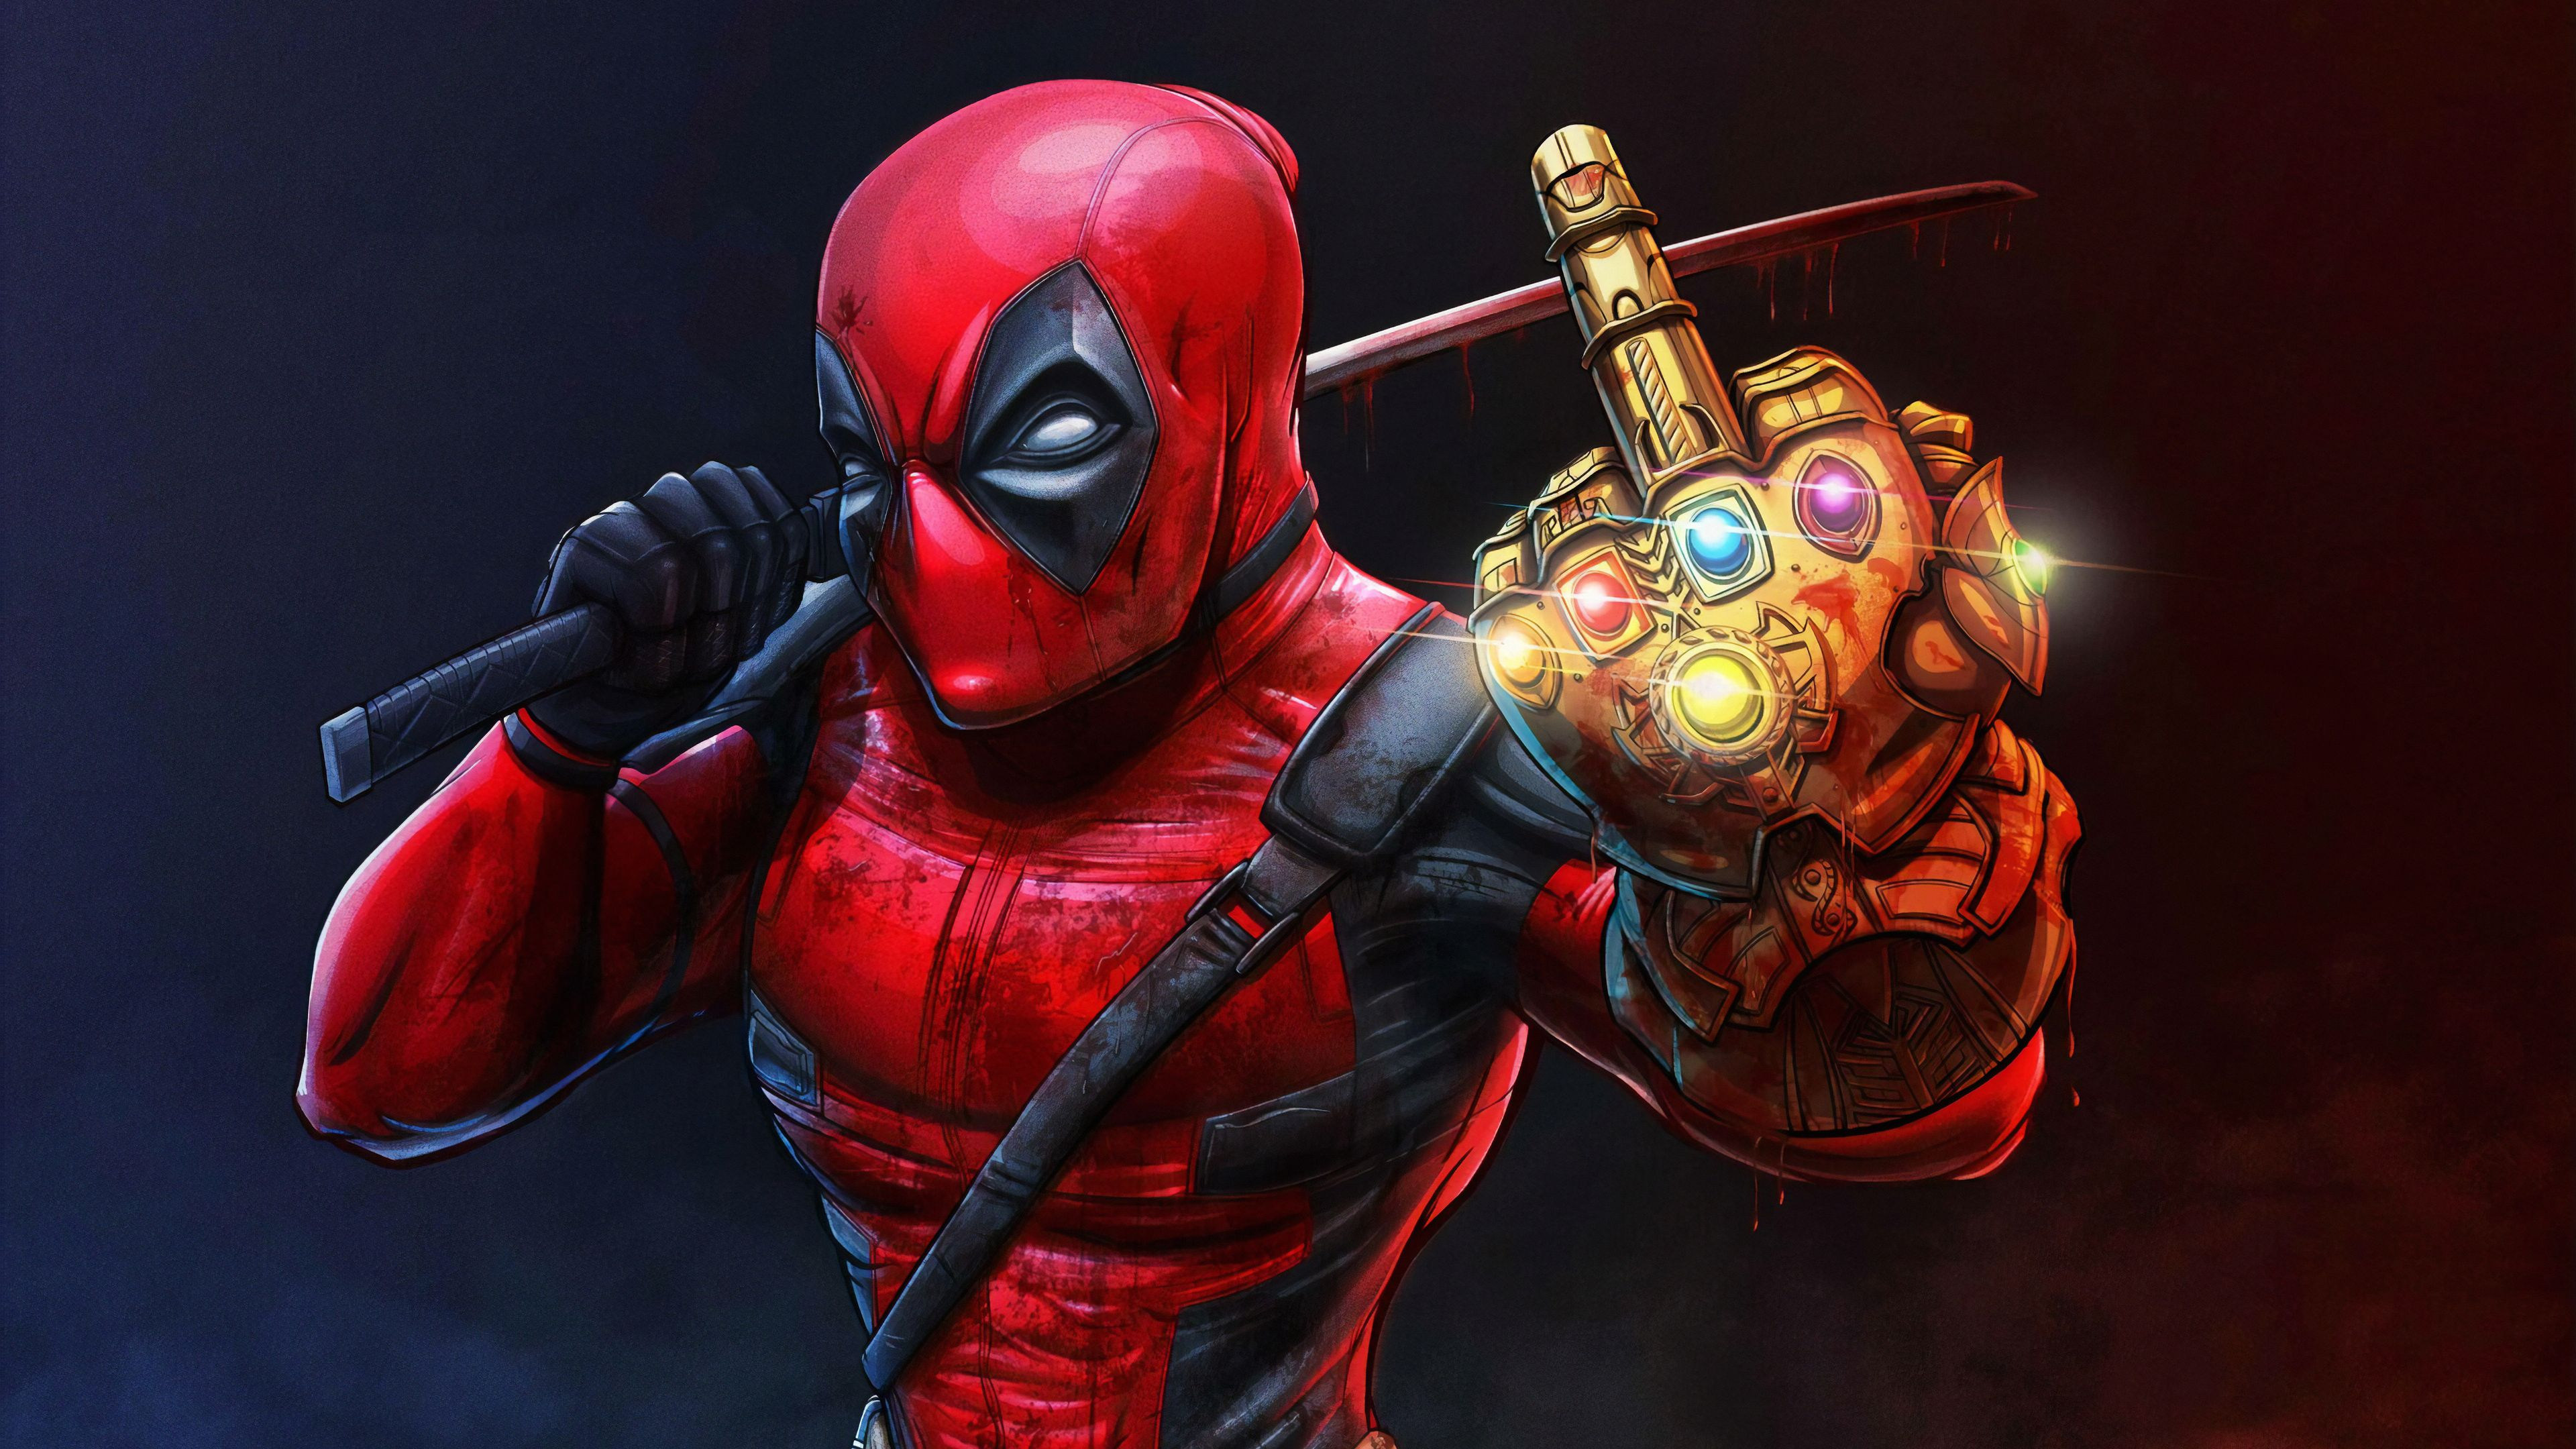 Deadpool With Thanos Infinity Gauntlet Superheroes Wallpapers Hd Wallpapers Digital Art Wallpapers Deadpool Wallp In 2020 Deadpool Wallpaper Spiderman Art Superhero